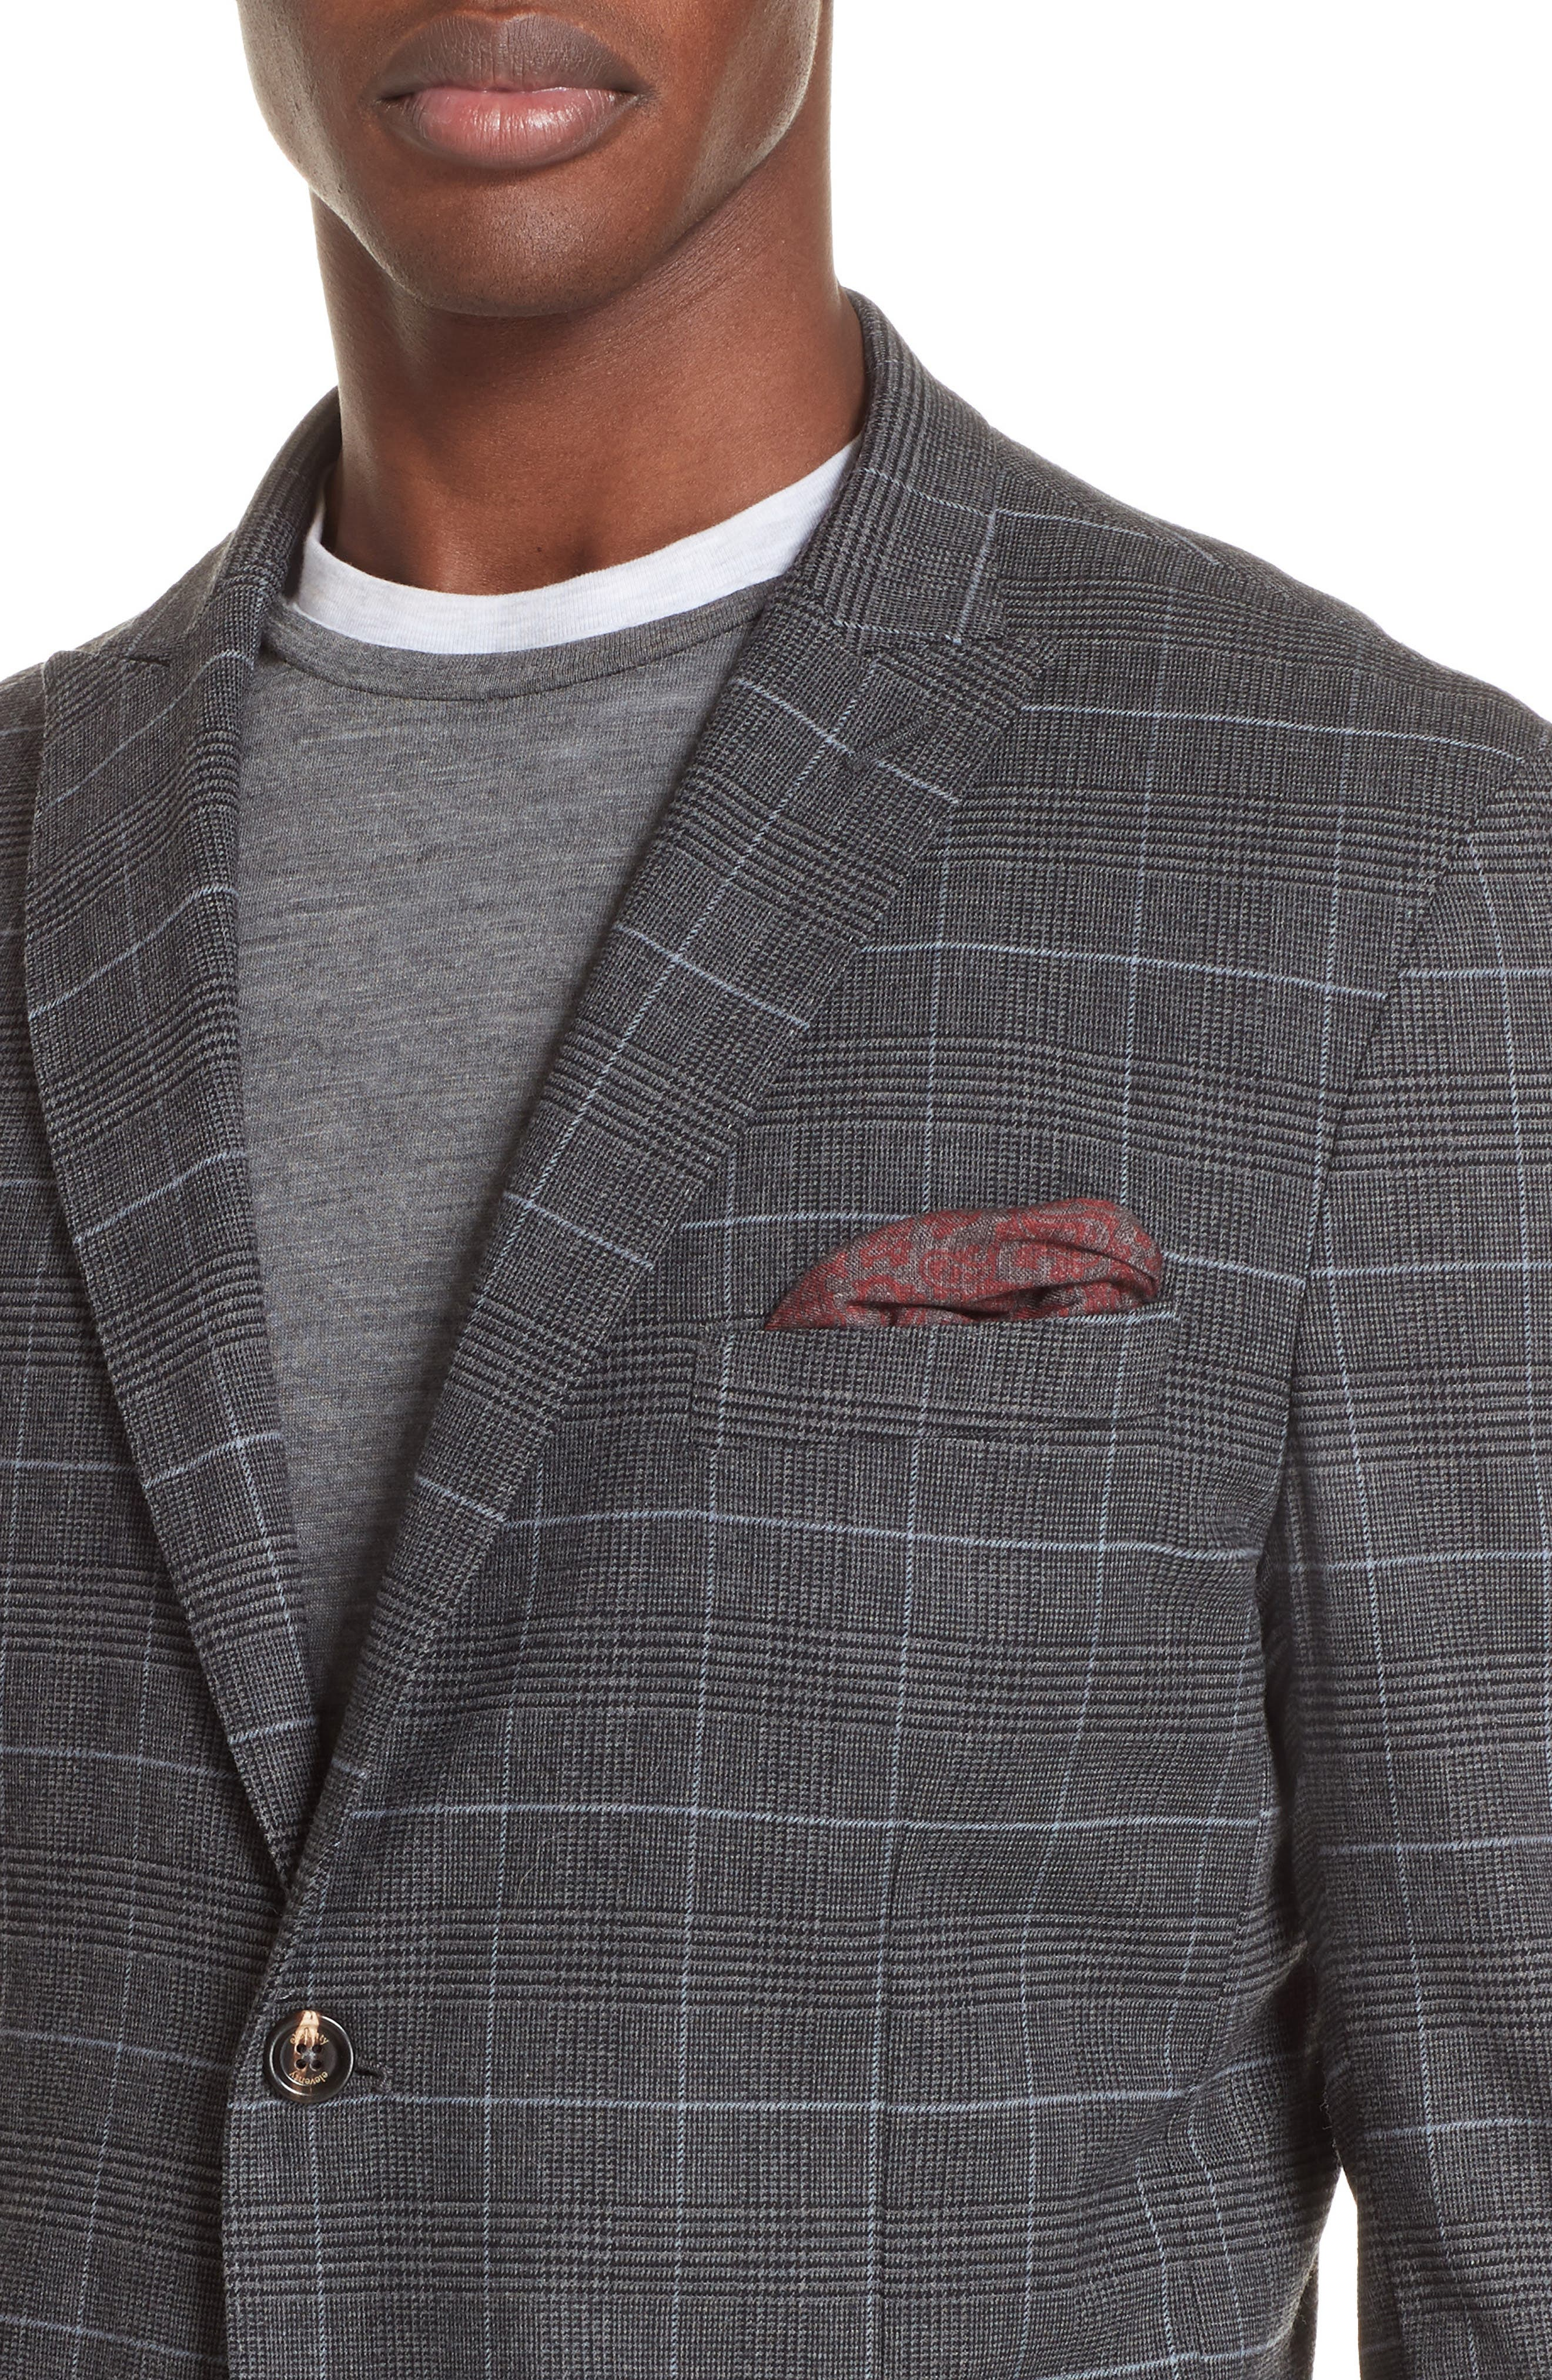 Trim Fit Stretch Plaid Wool Sport Coat,                             Alternate thumbnail 4, color,                             GREY